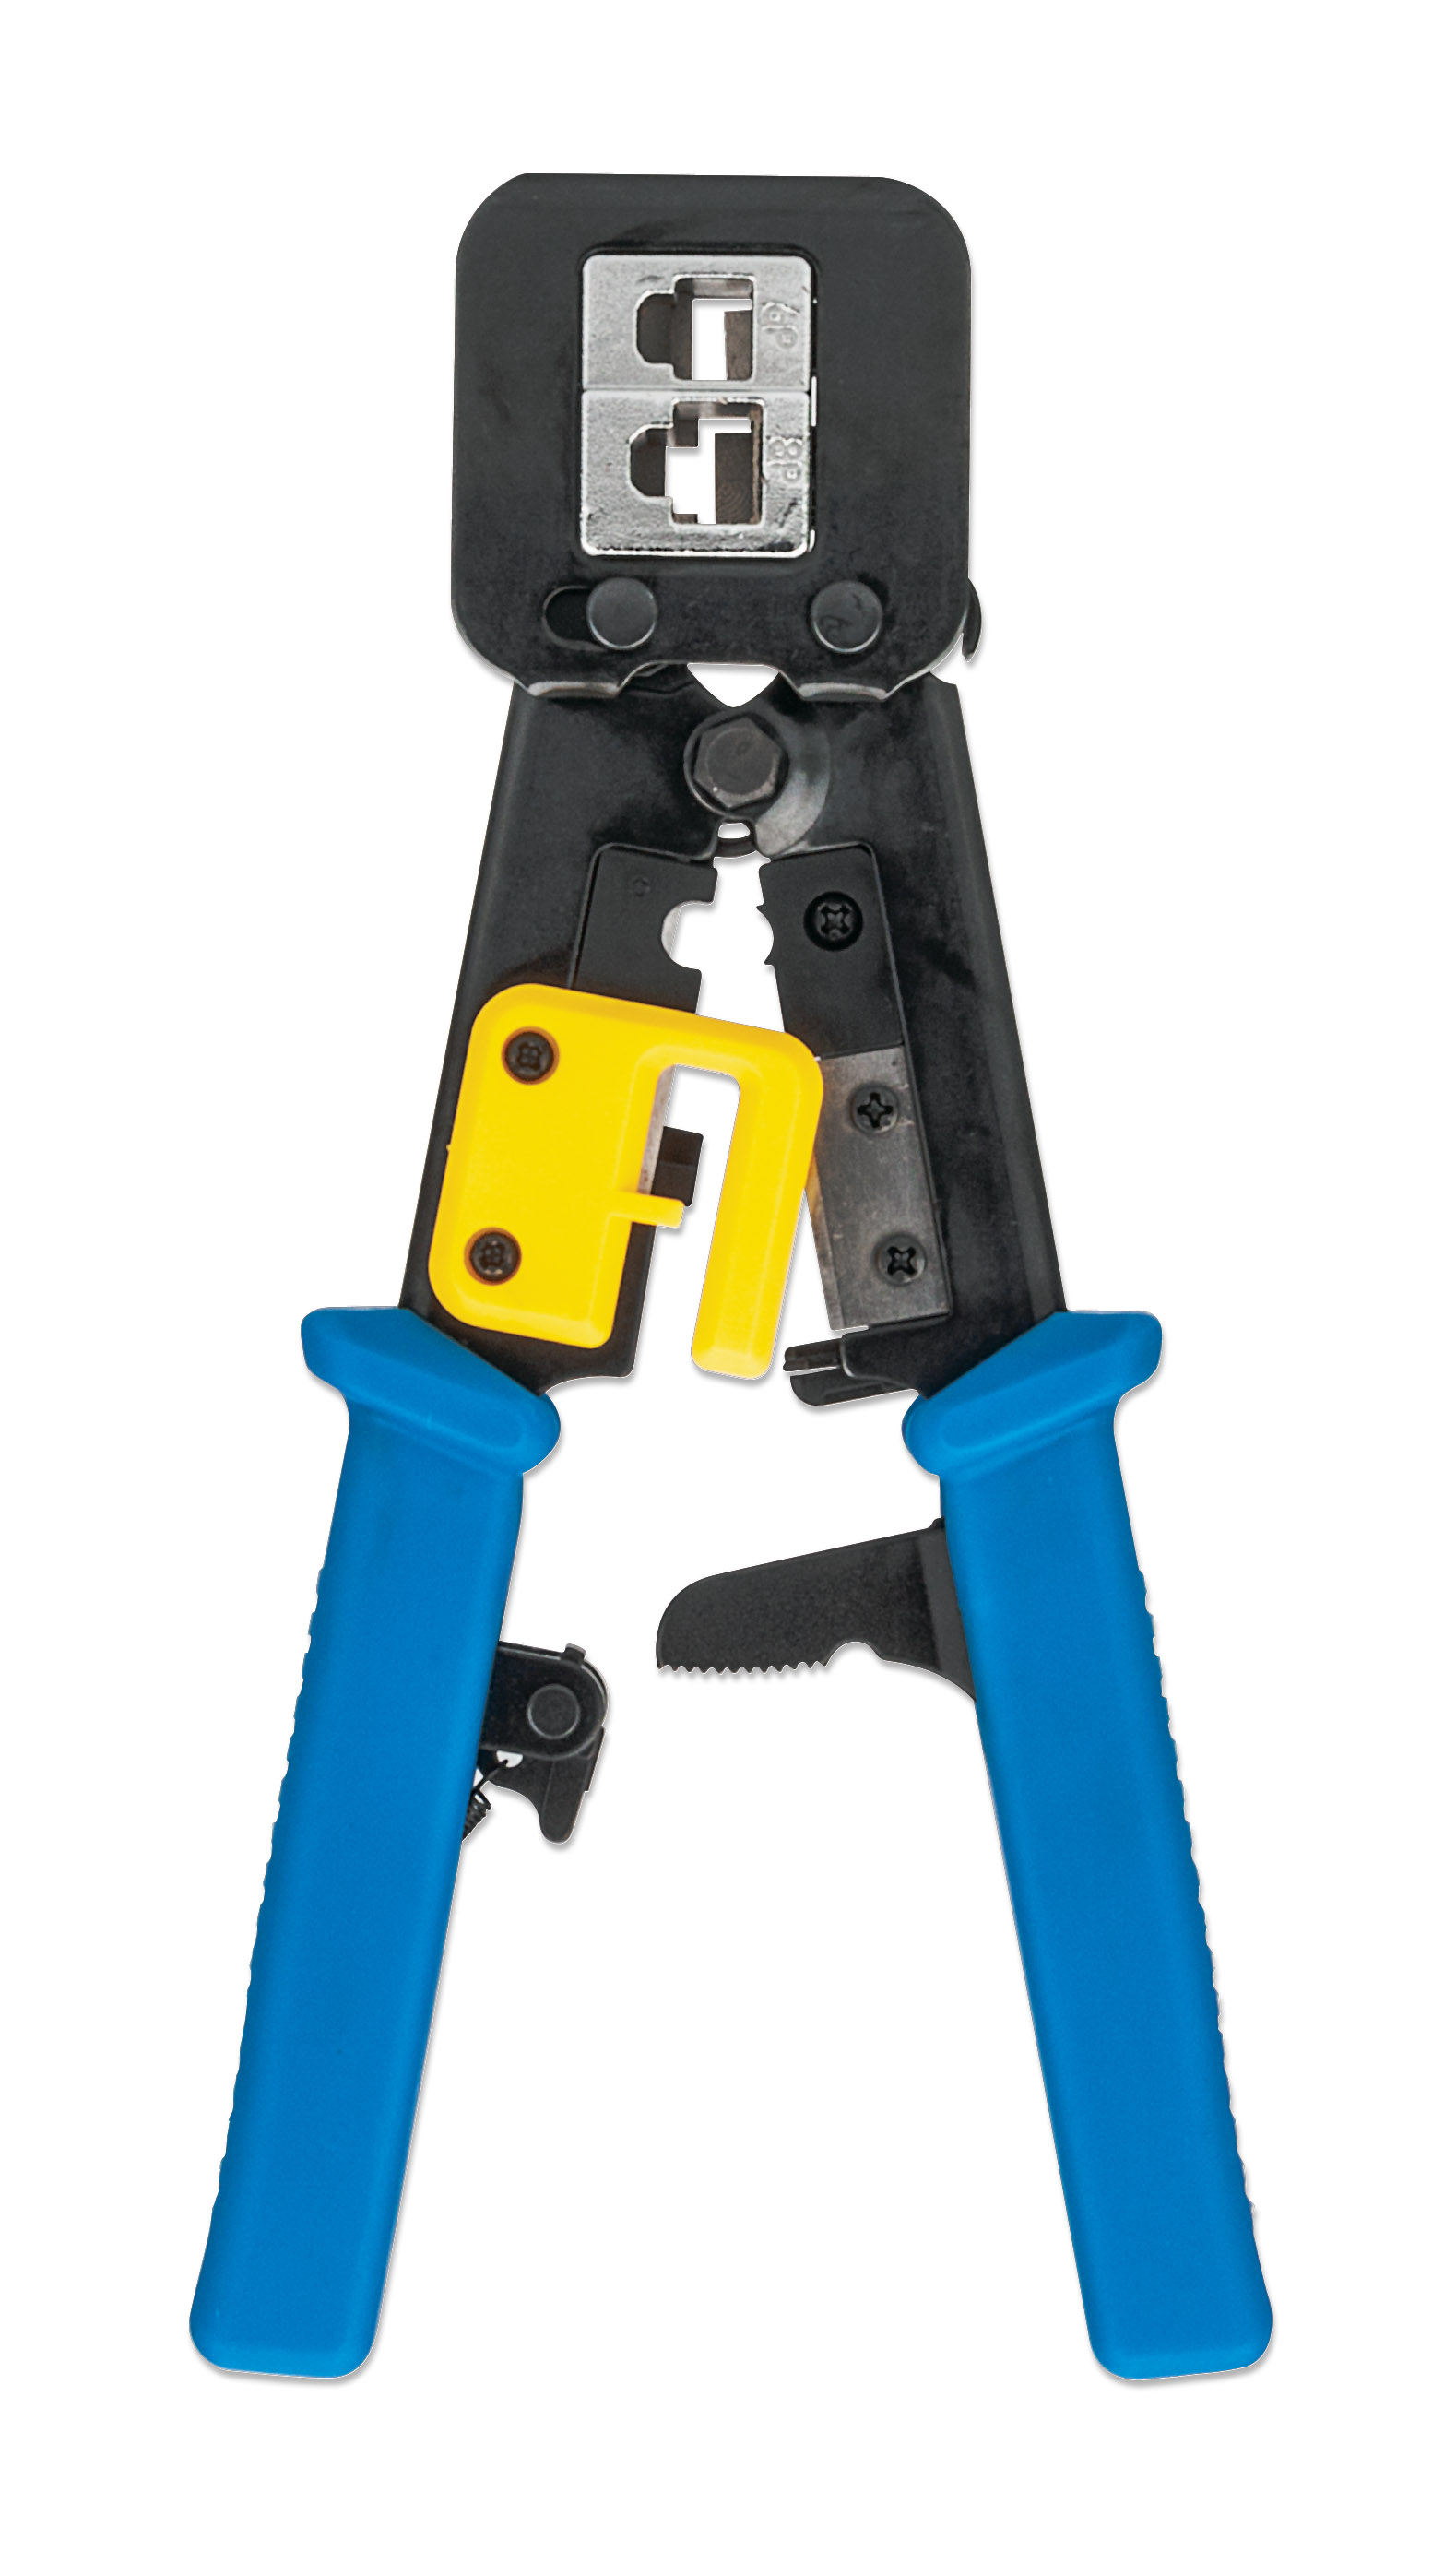 FastCrimp Modular Plug Crimping Tool